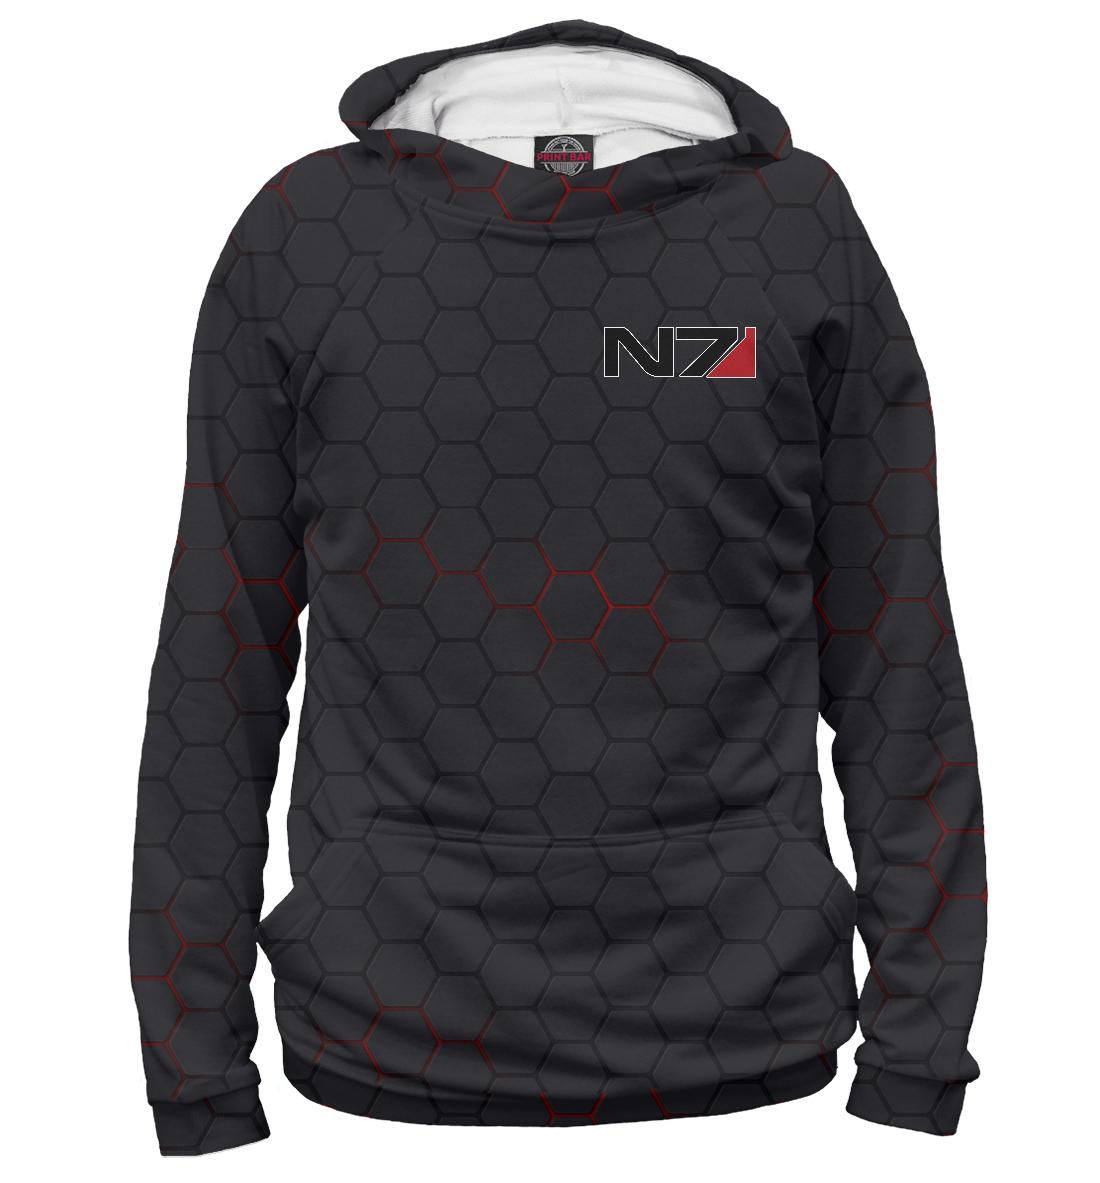 Купить N7 - Mass Effect, Printbar, Худи, MSE-717123-hud-2